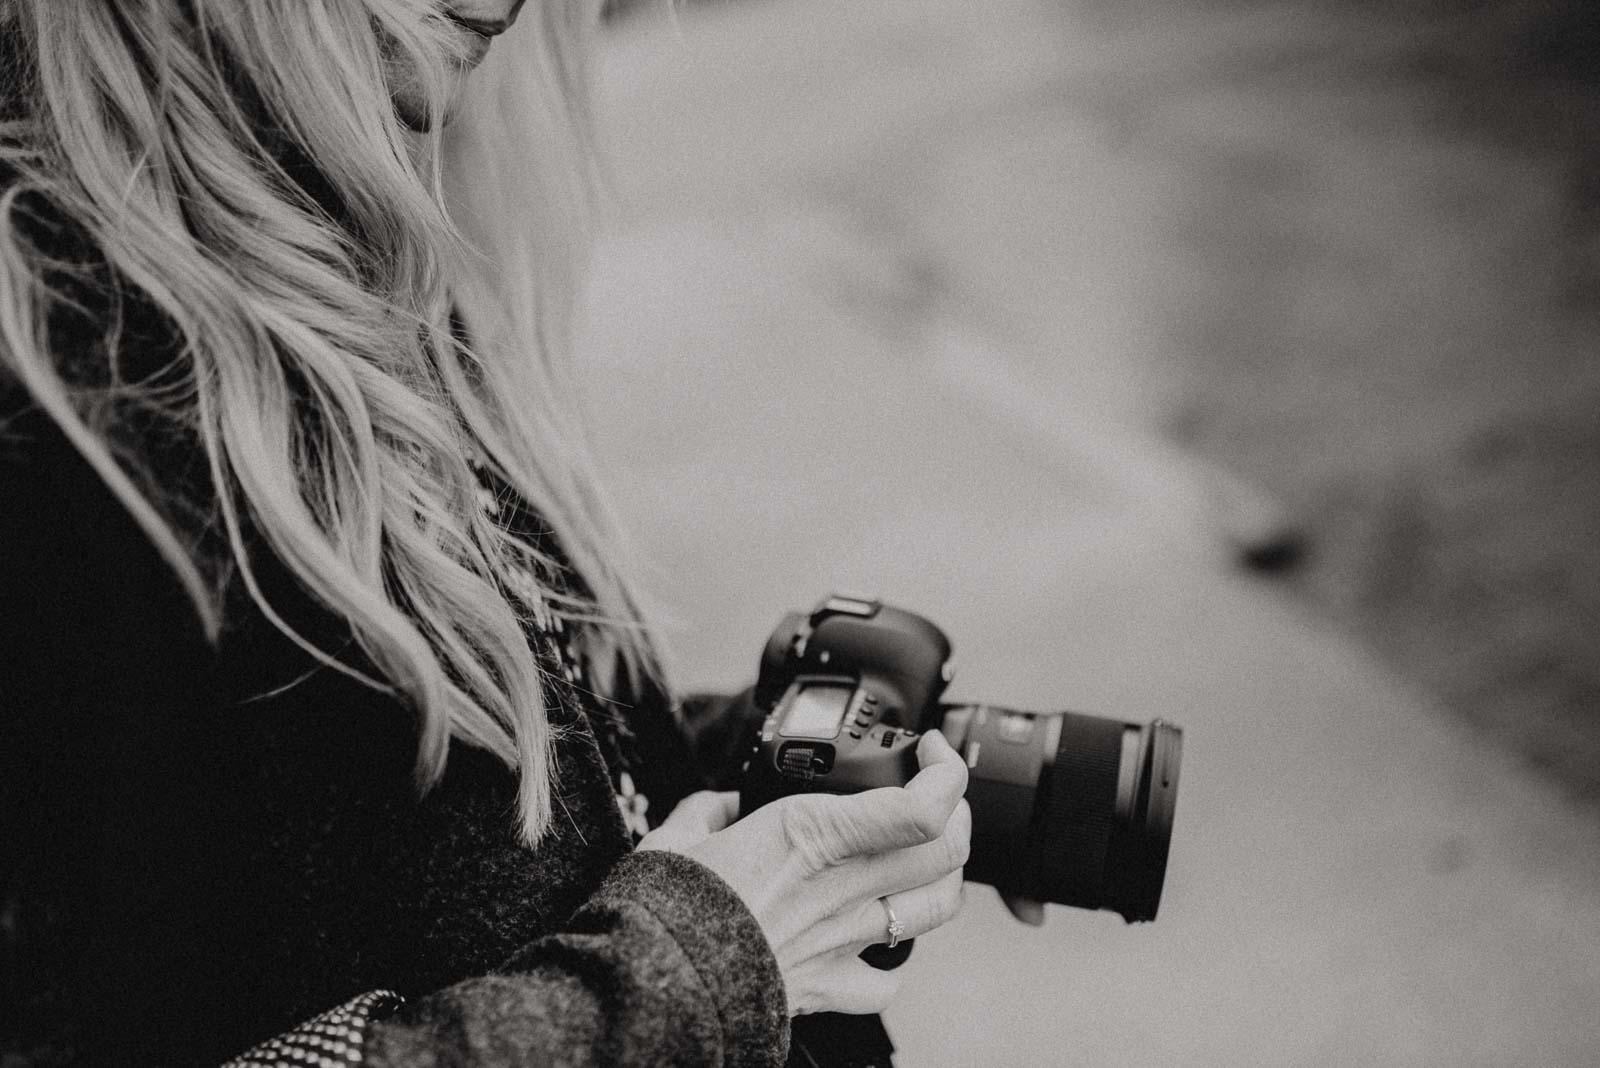 052-fotograf-witten-bochum-businessshooting-urban